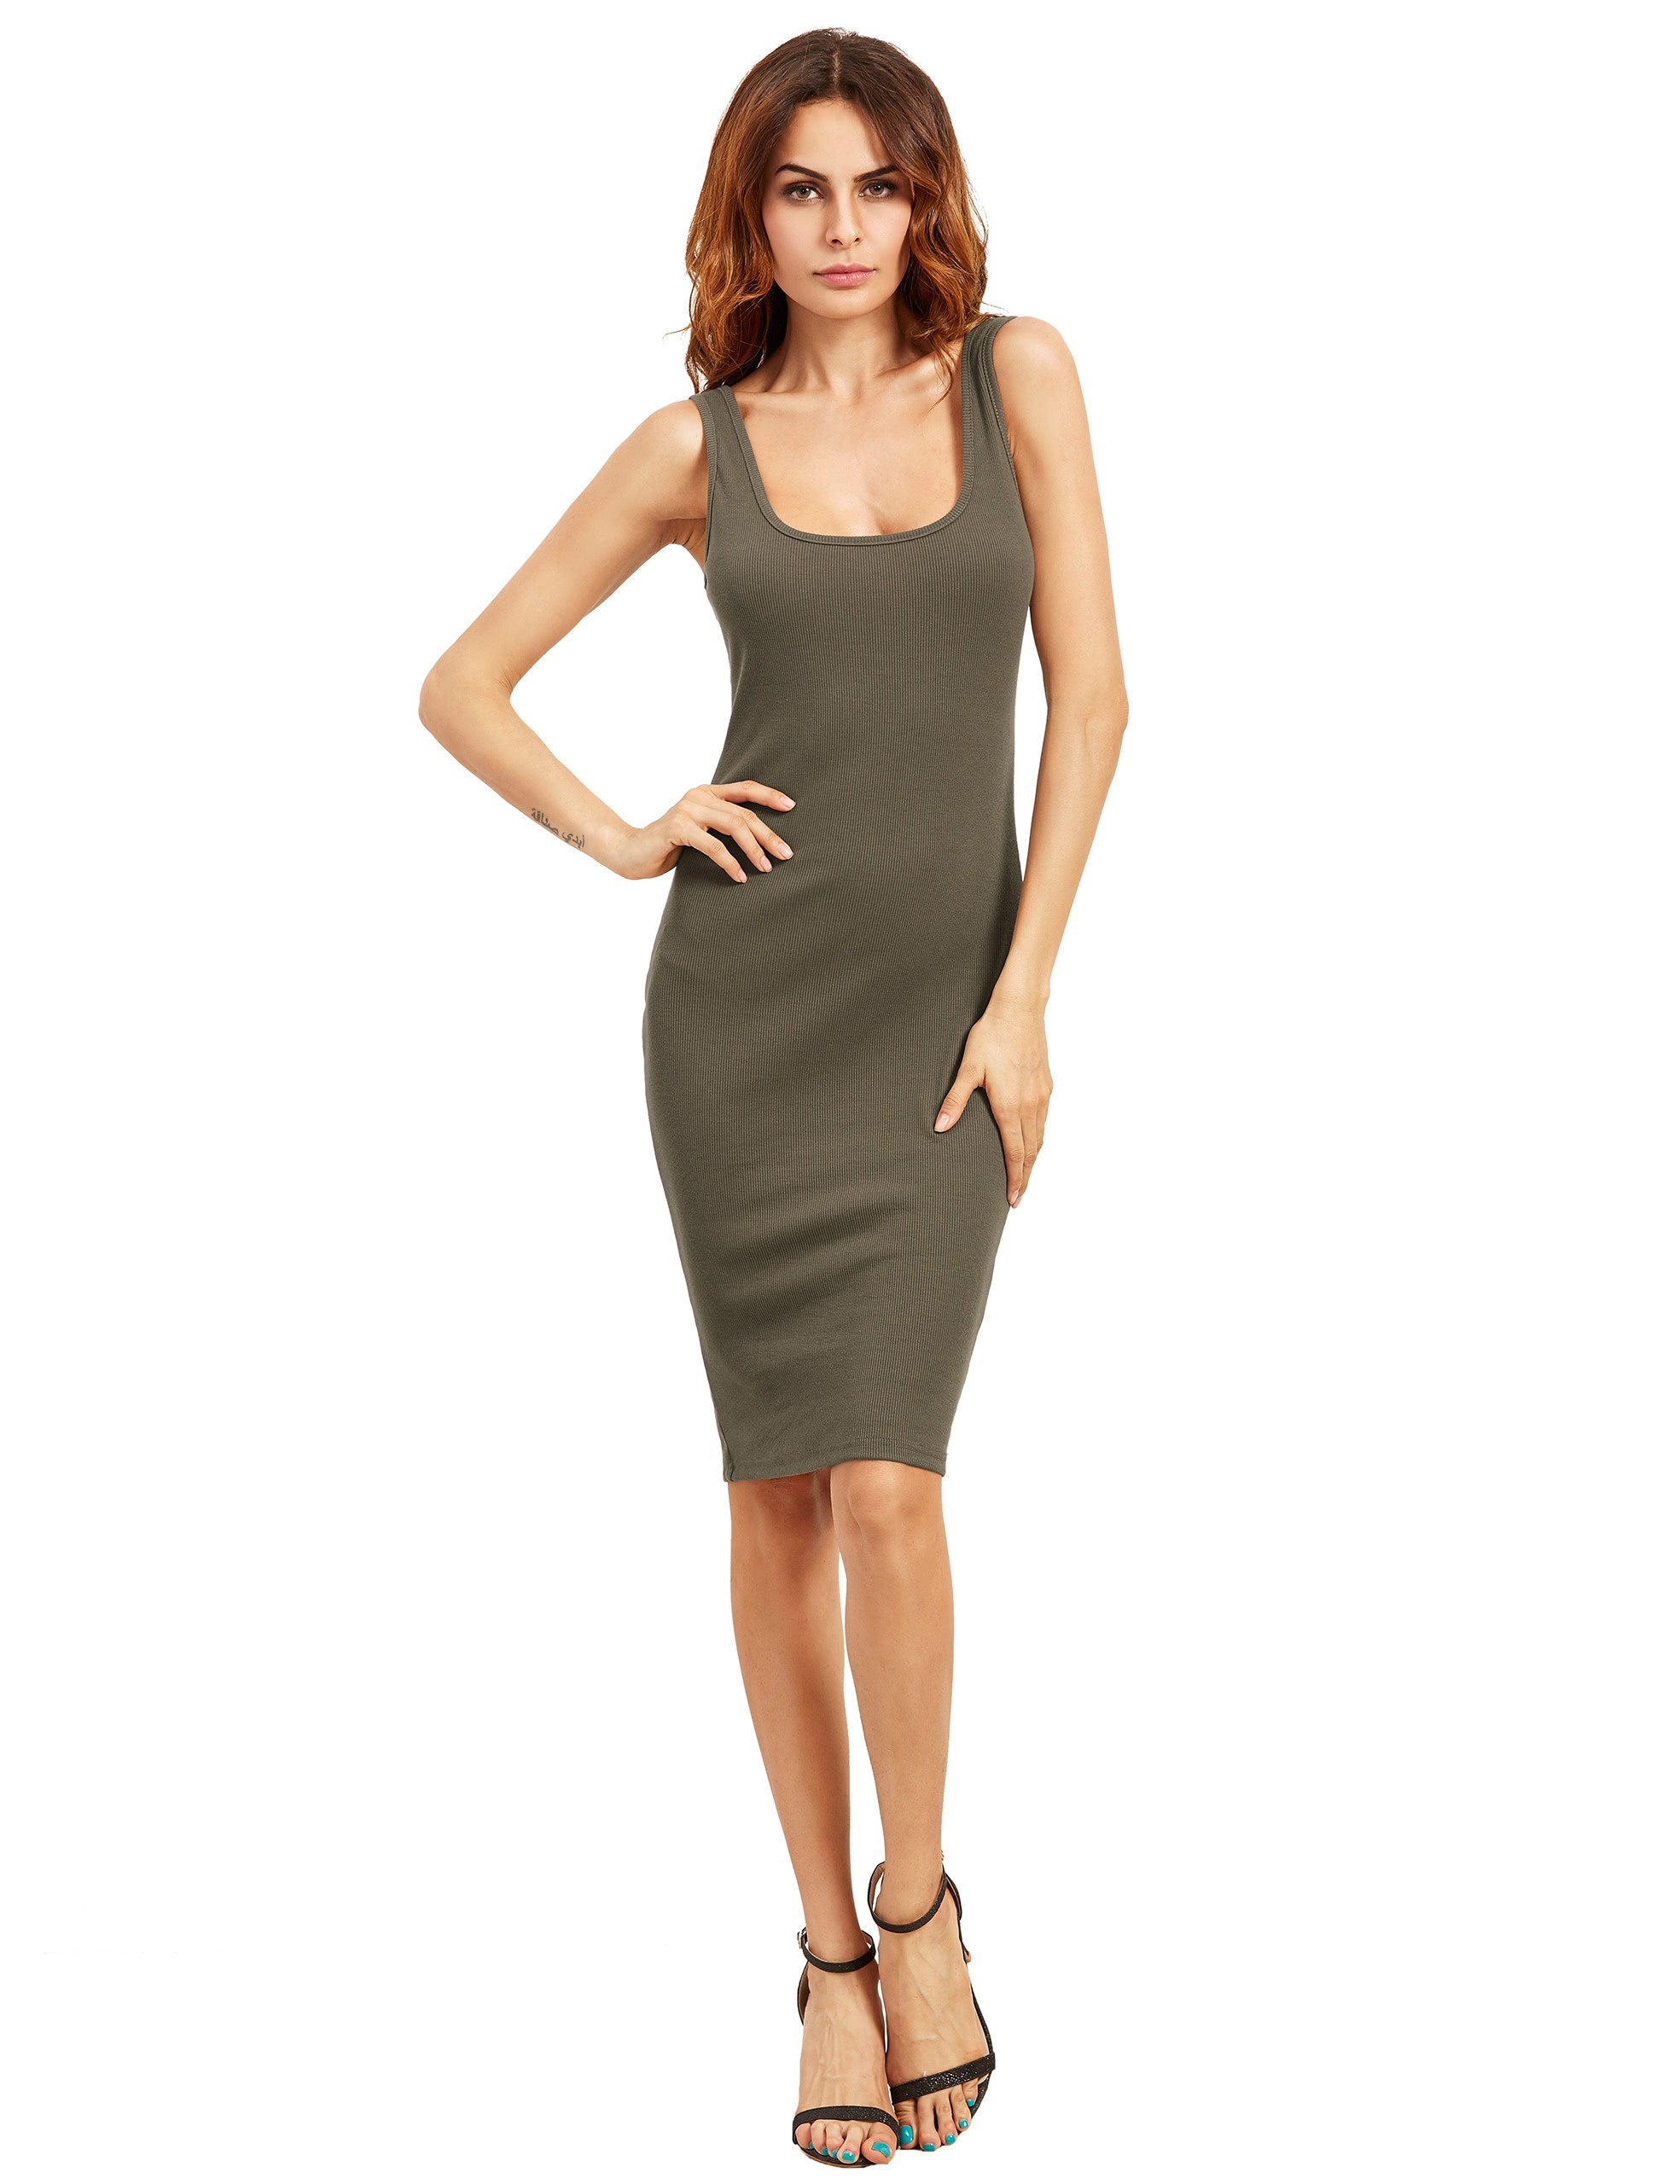 Perfekt Ärmellose Kleider Knielang Stylish15 Kreativ Ärmellose Kleider Knielang Design